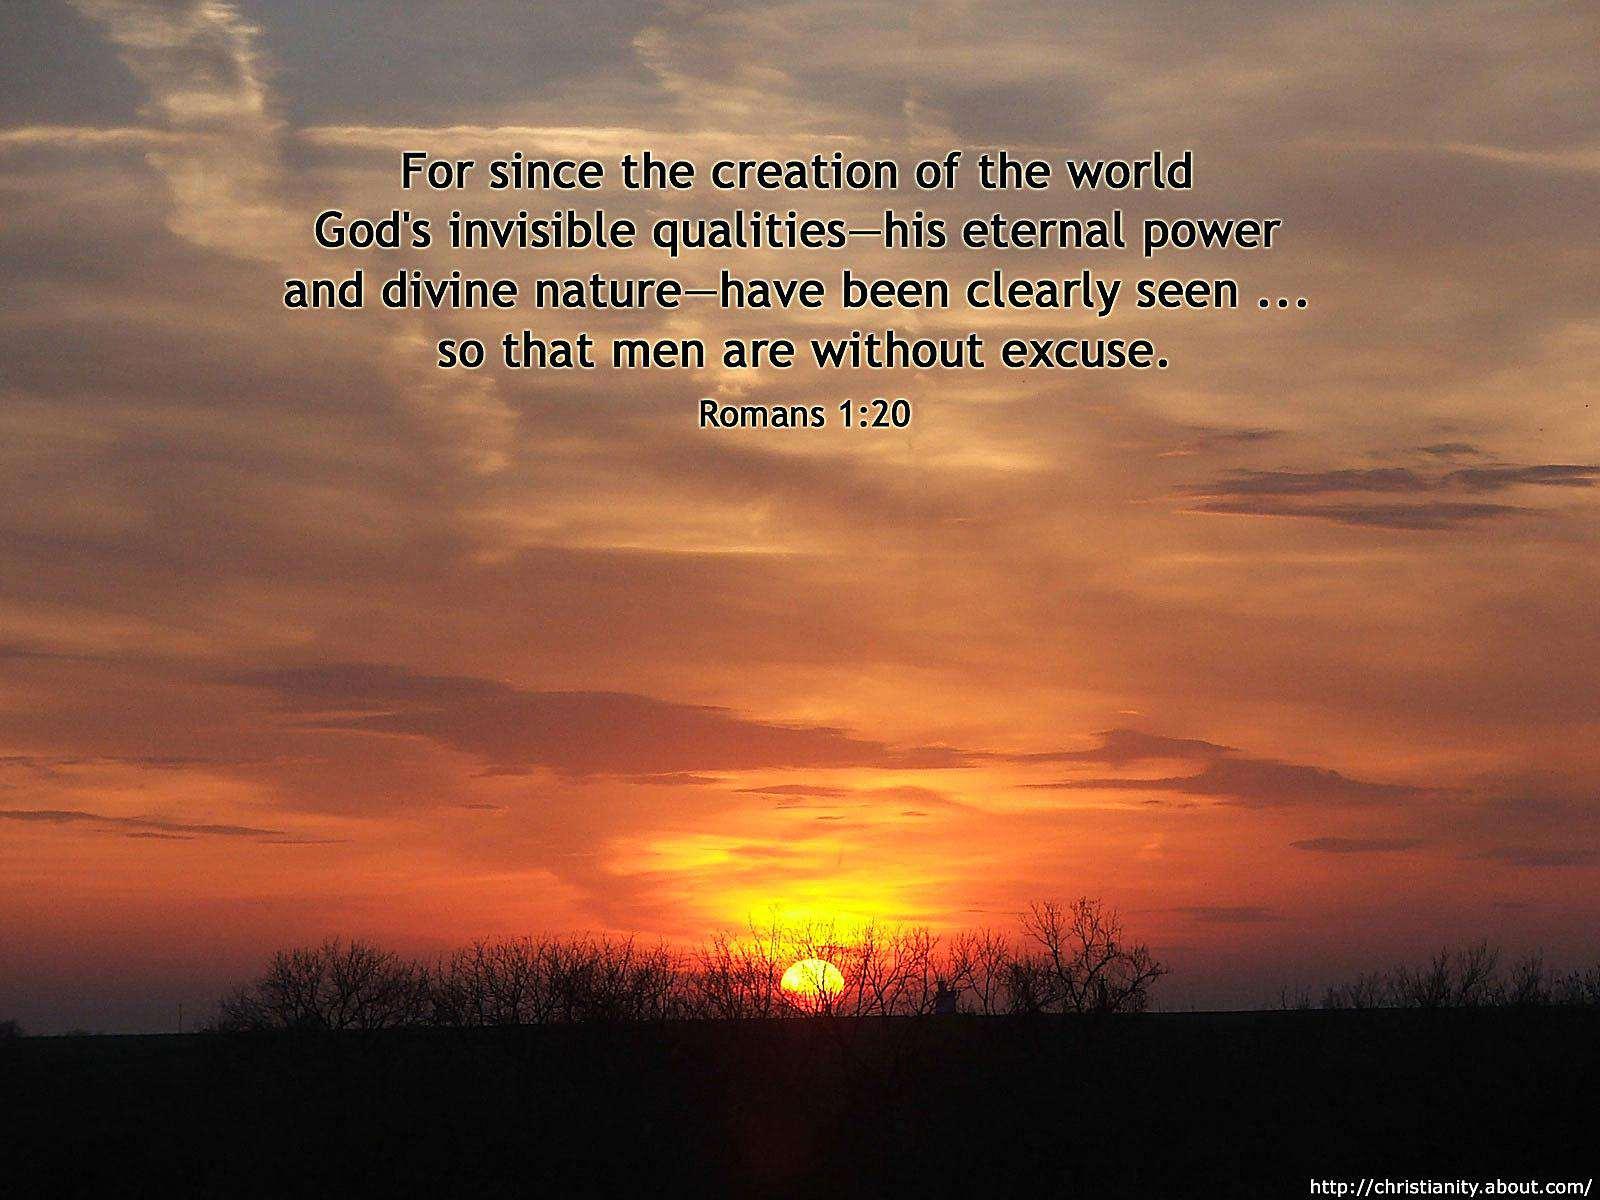 Setting Sun with bible verse